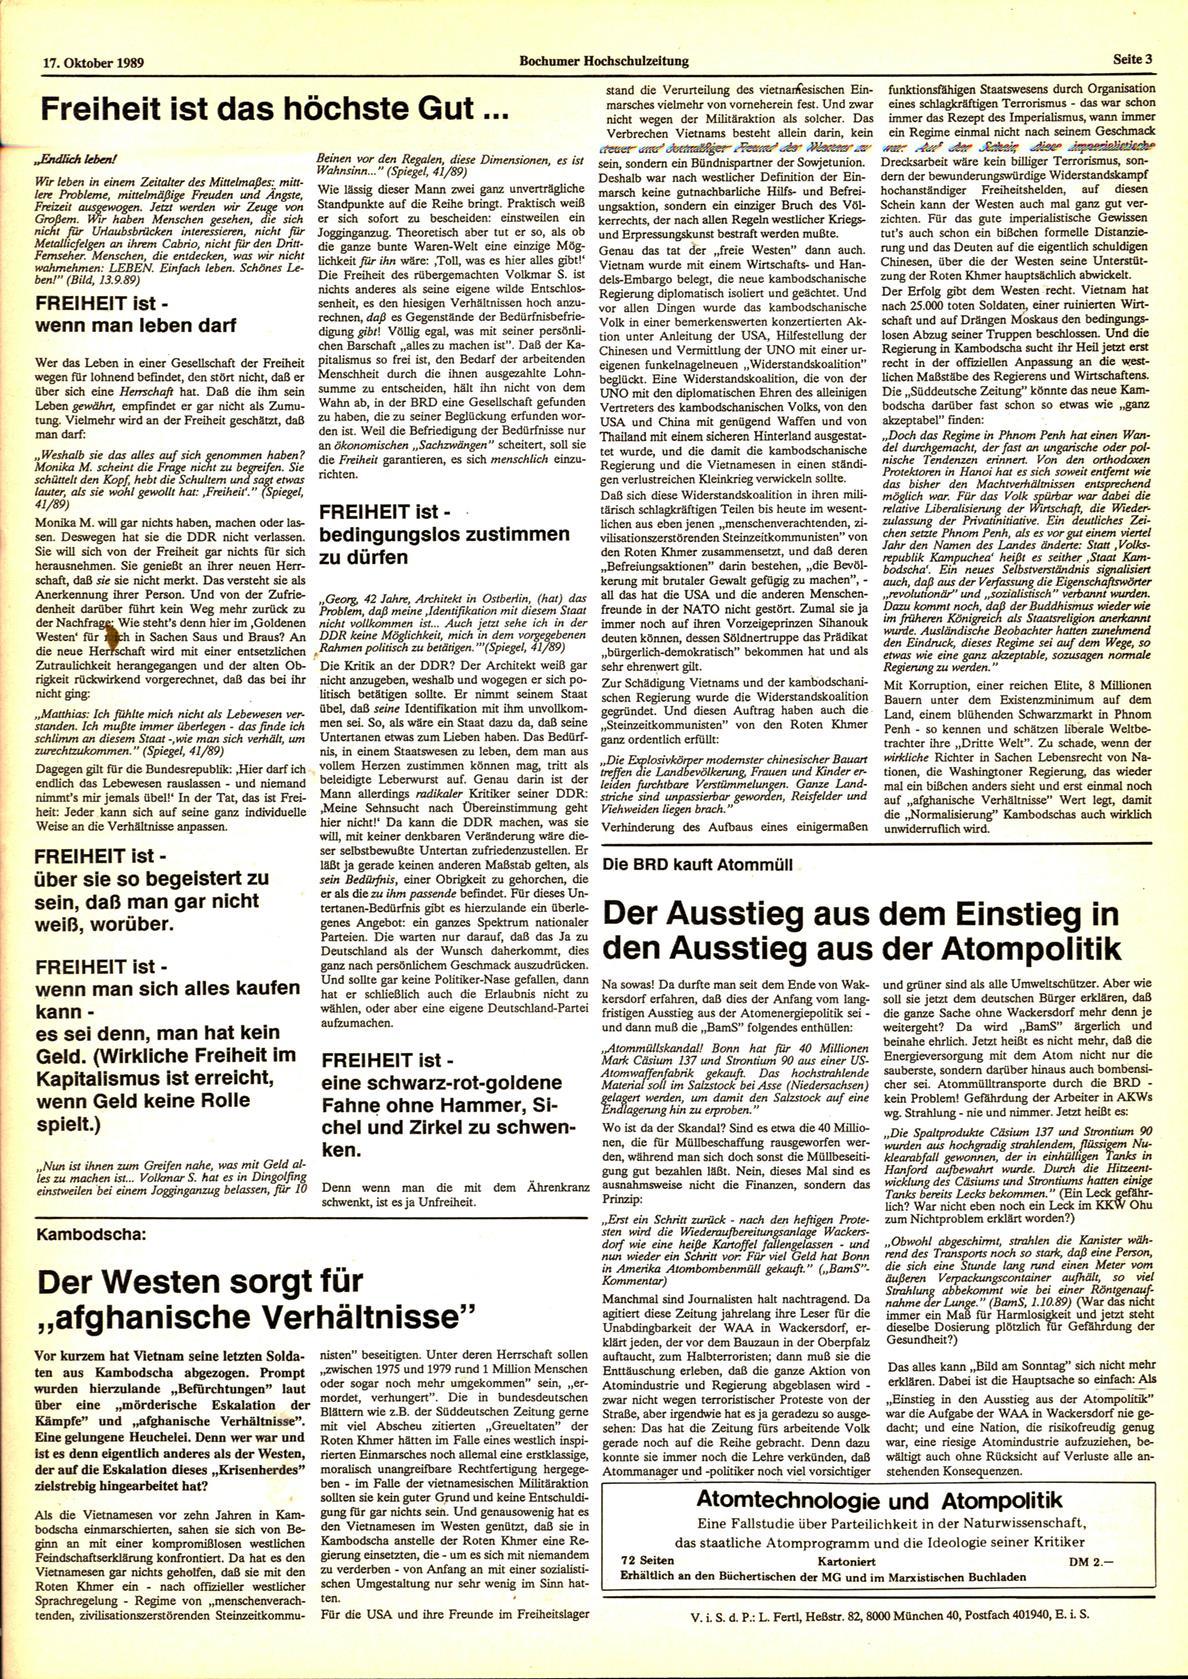 Bochum_BHZ_19891017_194_003